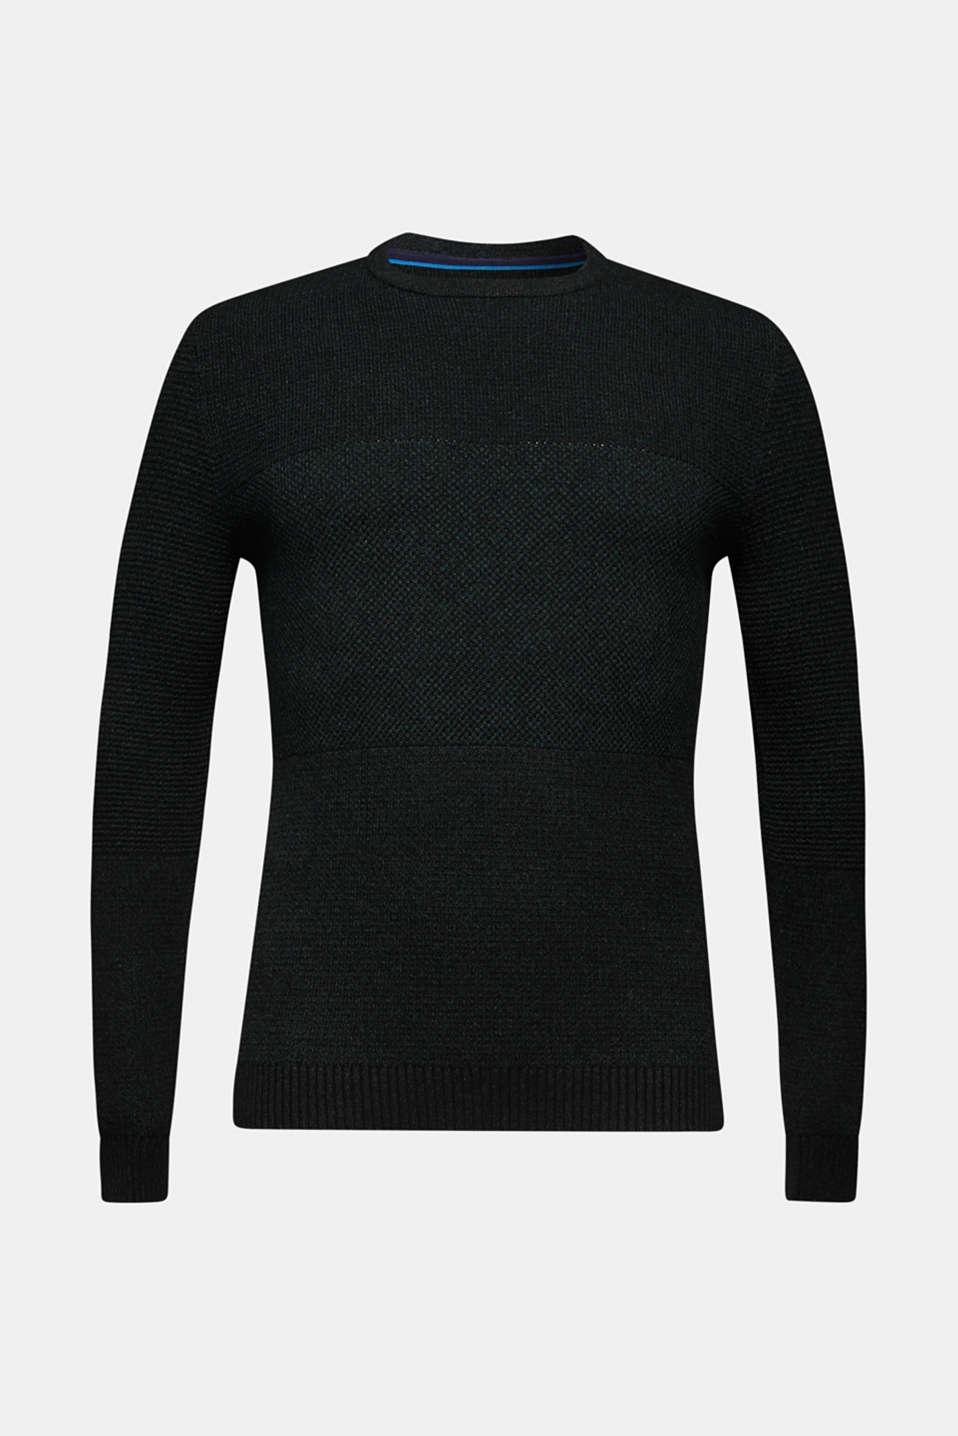 Jumper with textured stripes, 100% cotton, DARK GREEN, detail image number 6